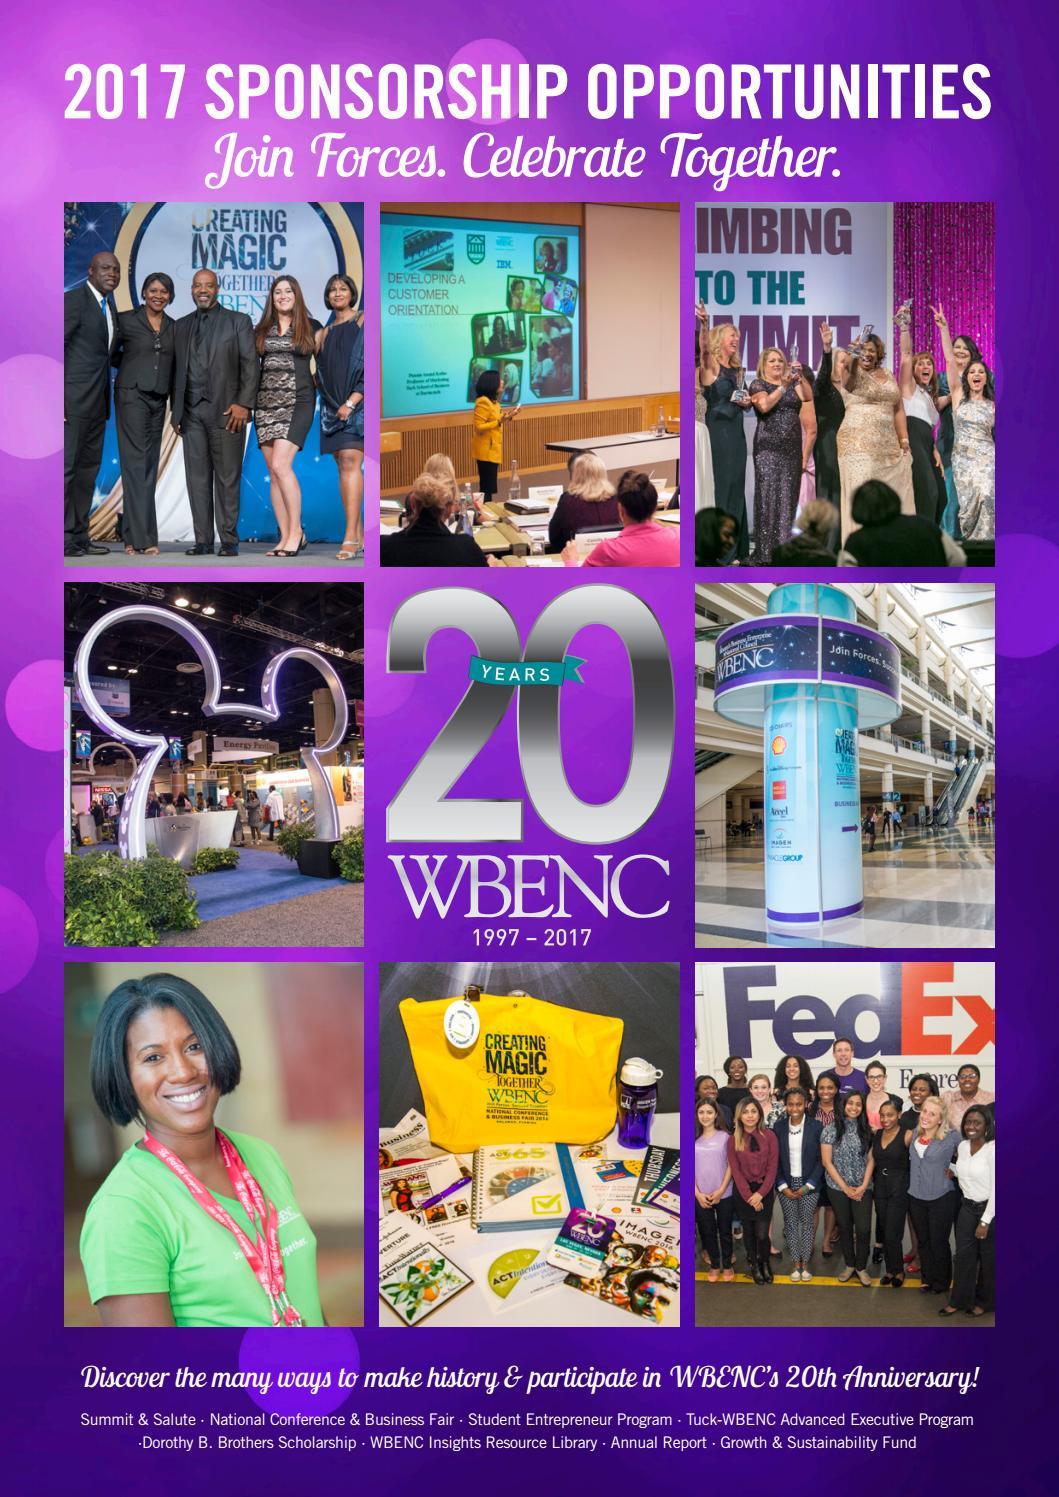 Wbenc 2017 Sponsorship Brochure By Wbenc Issuu